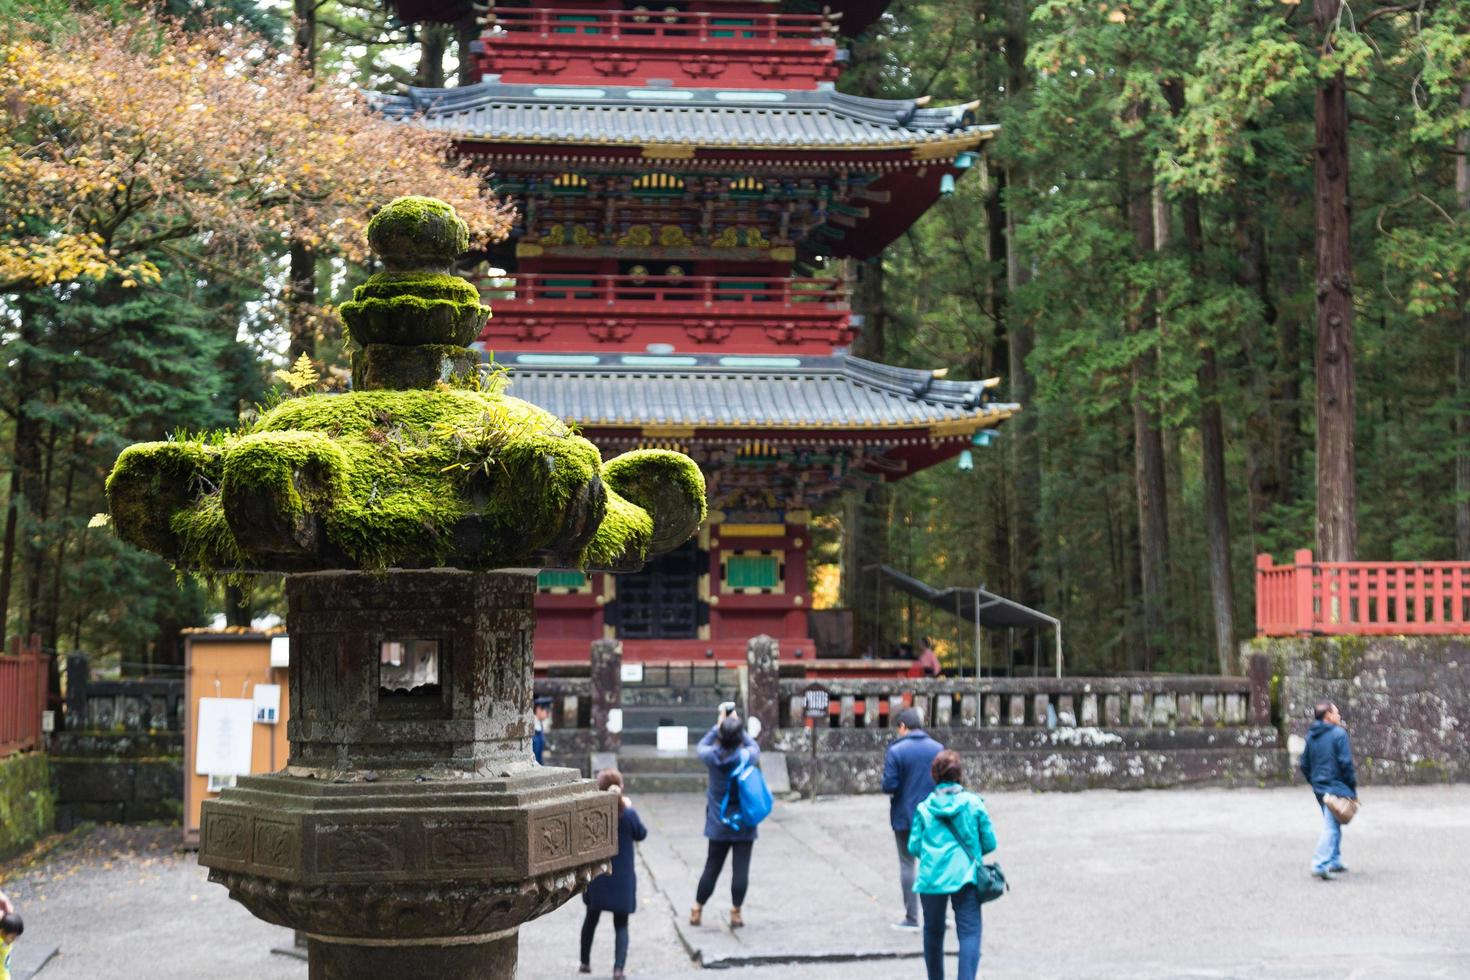 nikko toshogu-tempel in Tokio, 2016 foto